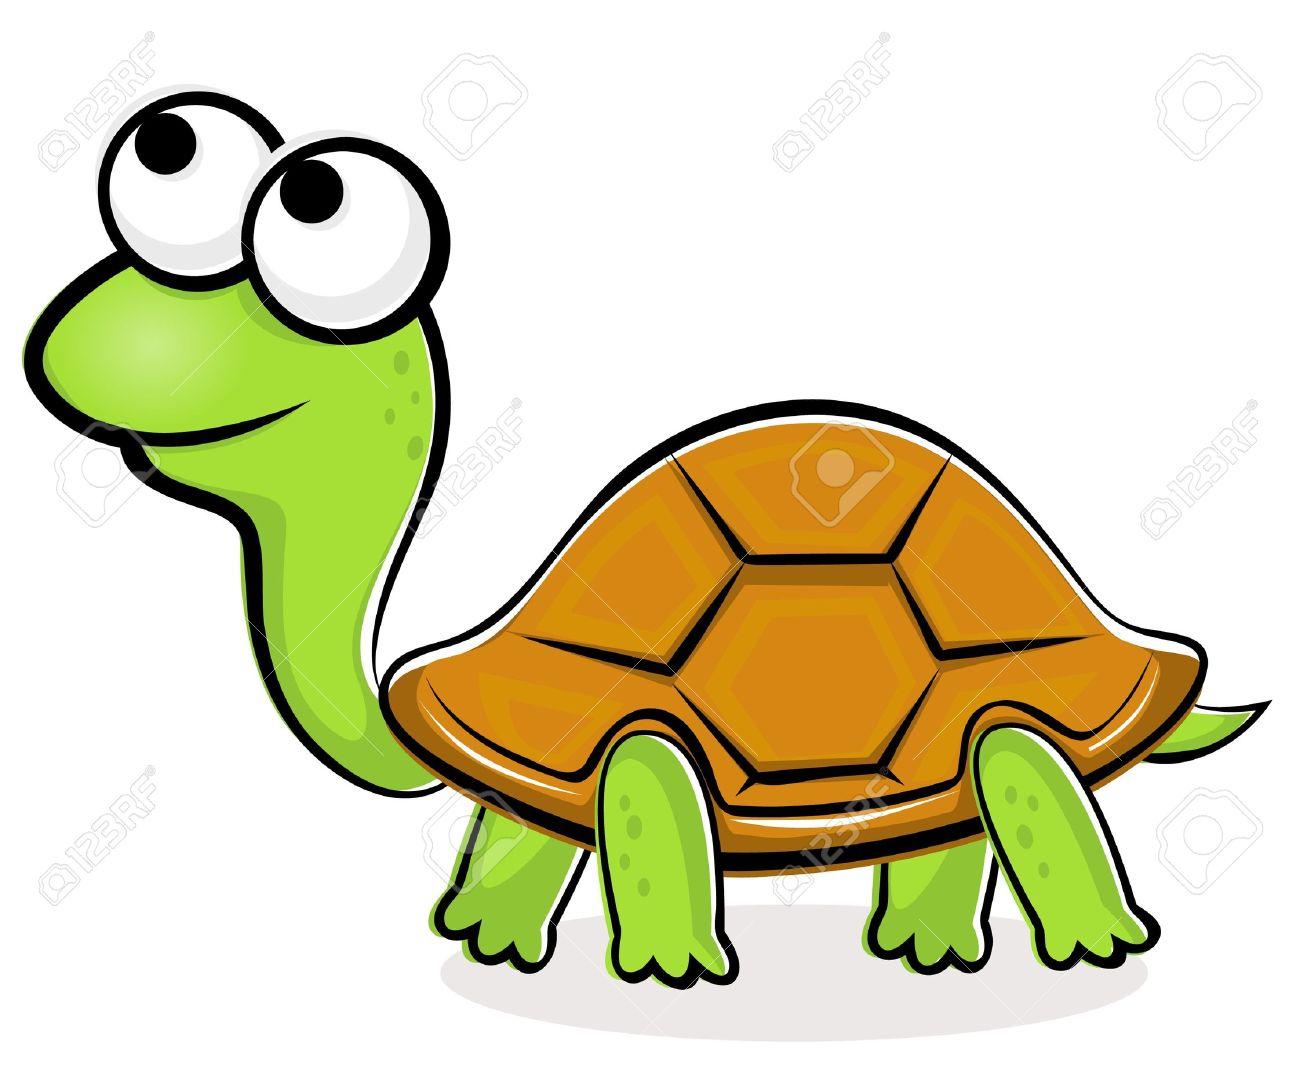 tortoise clipart clipart panda free clipart images rh clipartpanda com tortoise clipart black and white tortoise clipart black and white